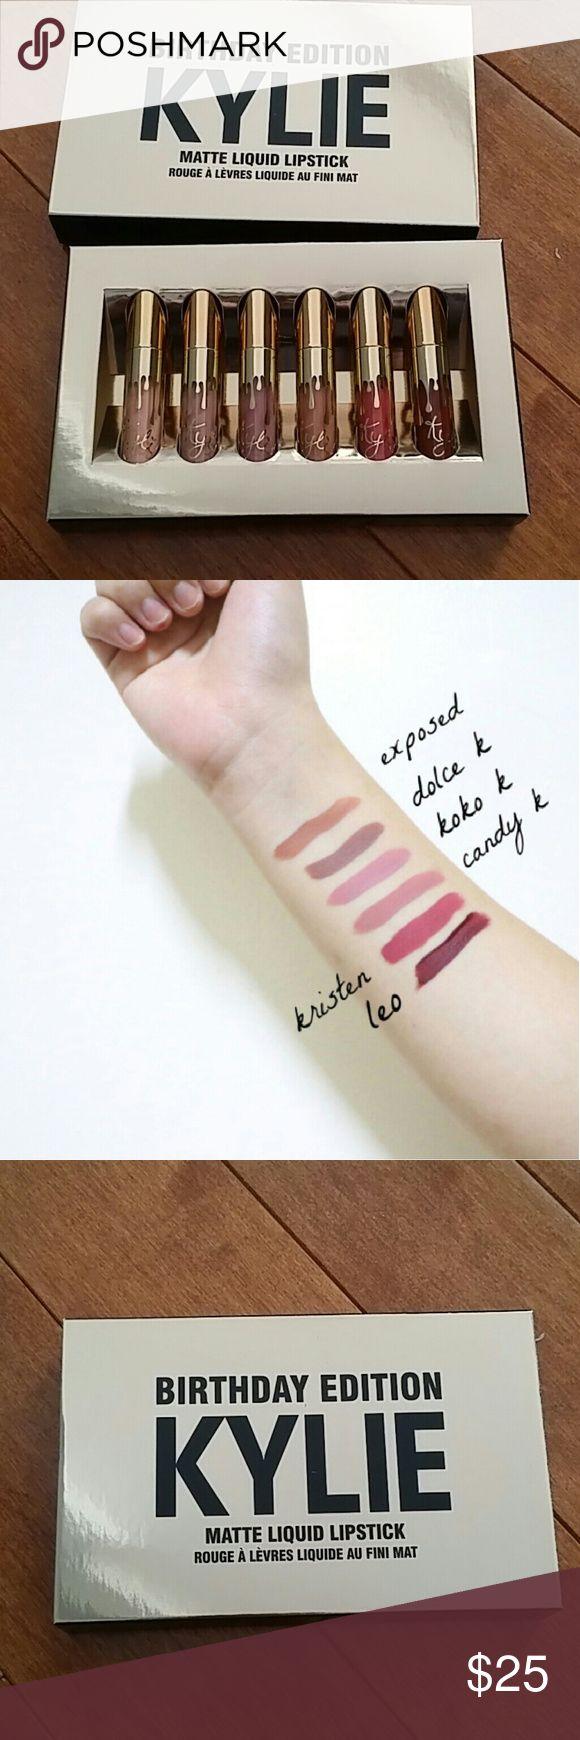 Kylie Birthday Edition mini matte liquid lipsticks Kylie 19th Birthday Edition six mini matte liquid lipsticks. Kylie Cosmetics Makeup Lip Balm & Gloss